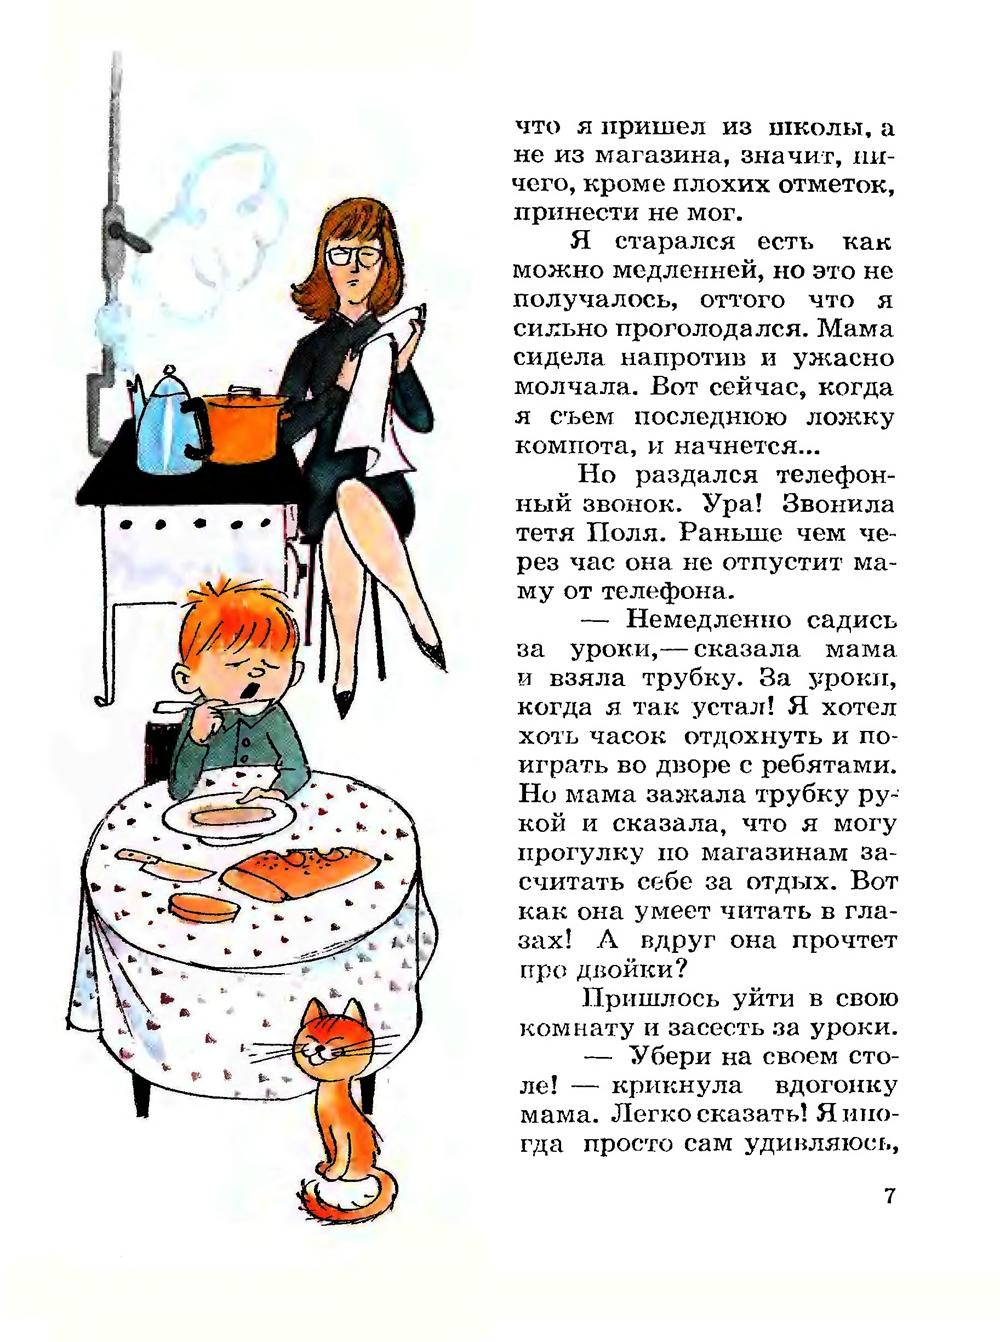 https://i2.imageban.ru/out/2020/08/28/66a479cbff1064005b6e9270c6cbb75c.jpg